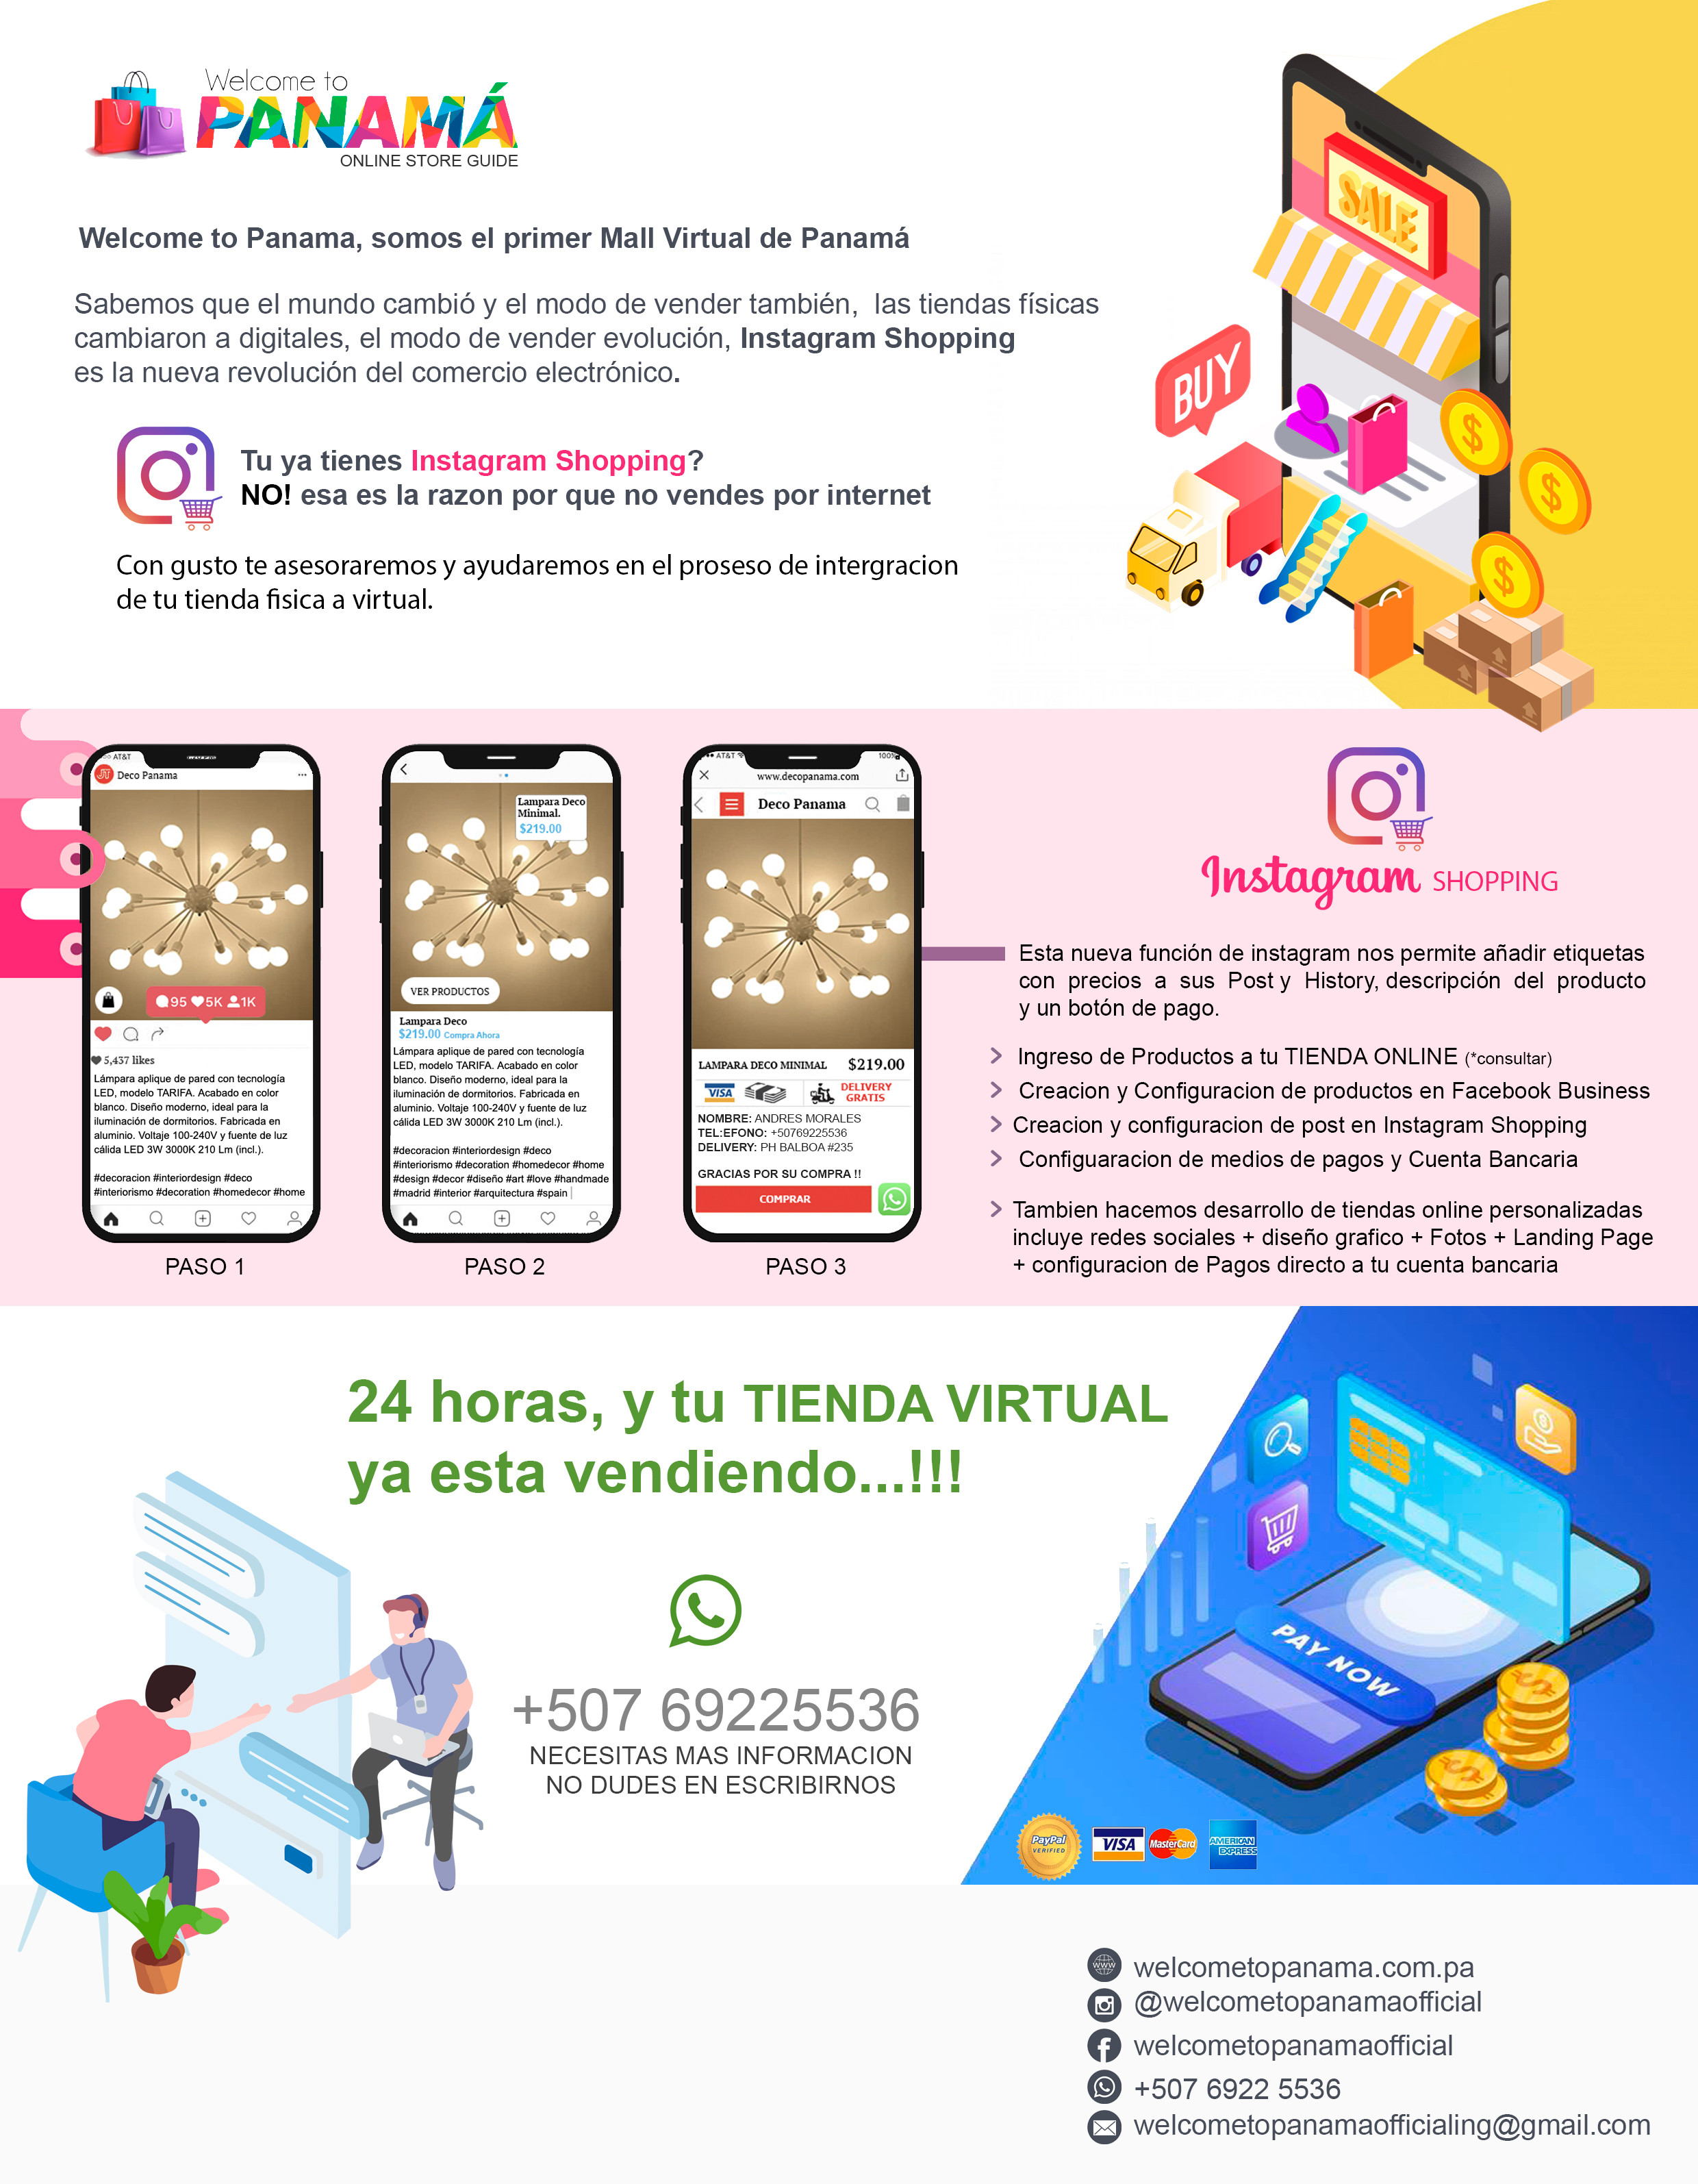 Plan Instagram Shopping y Tienda ONLINE